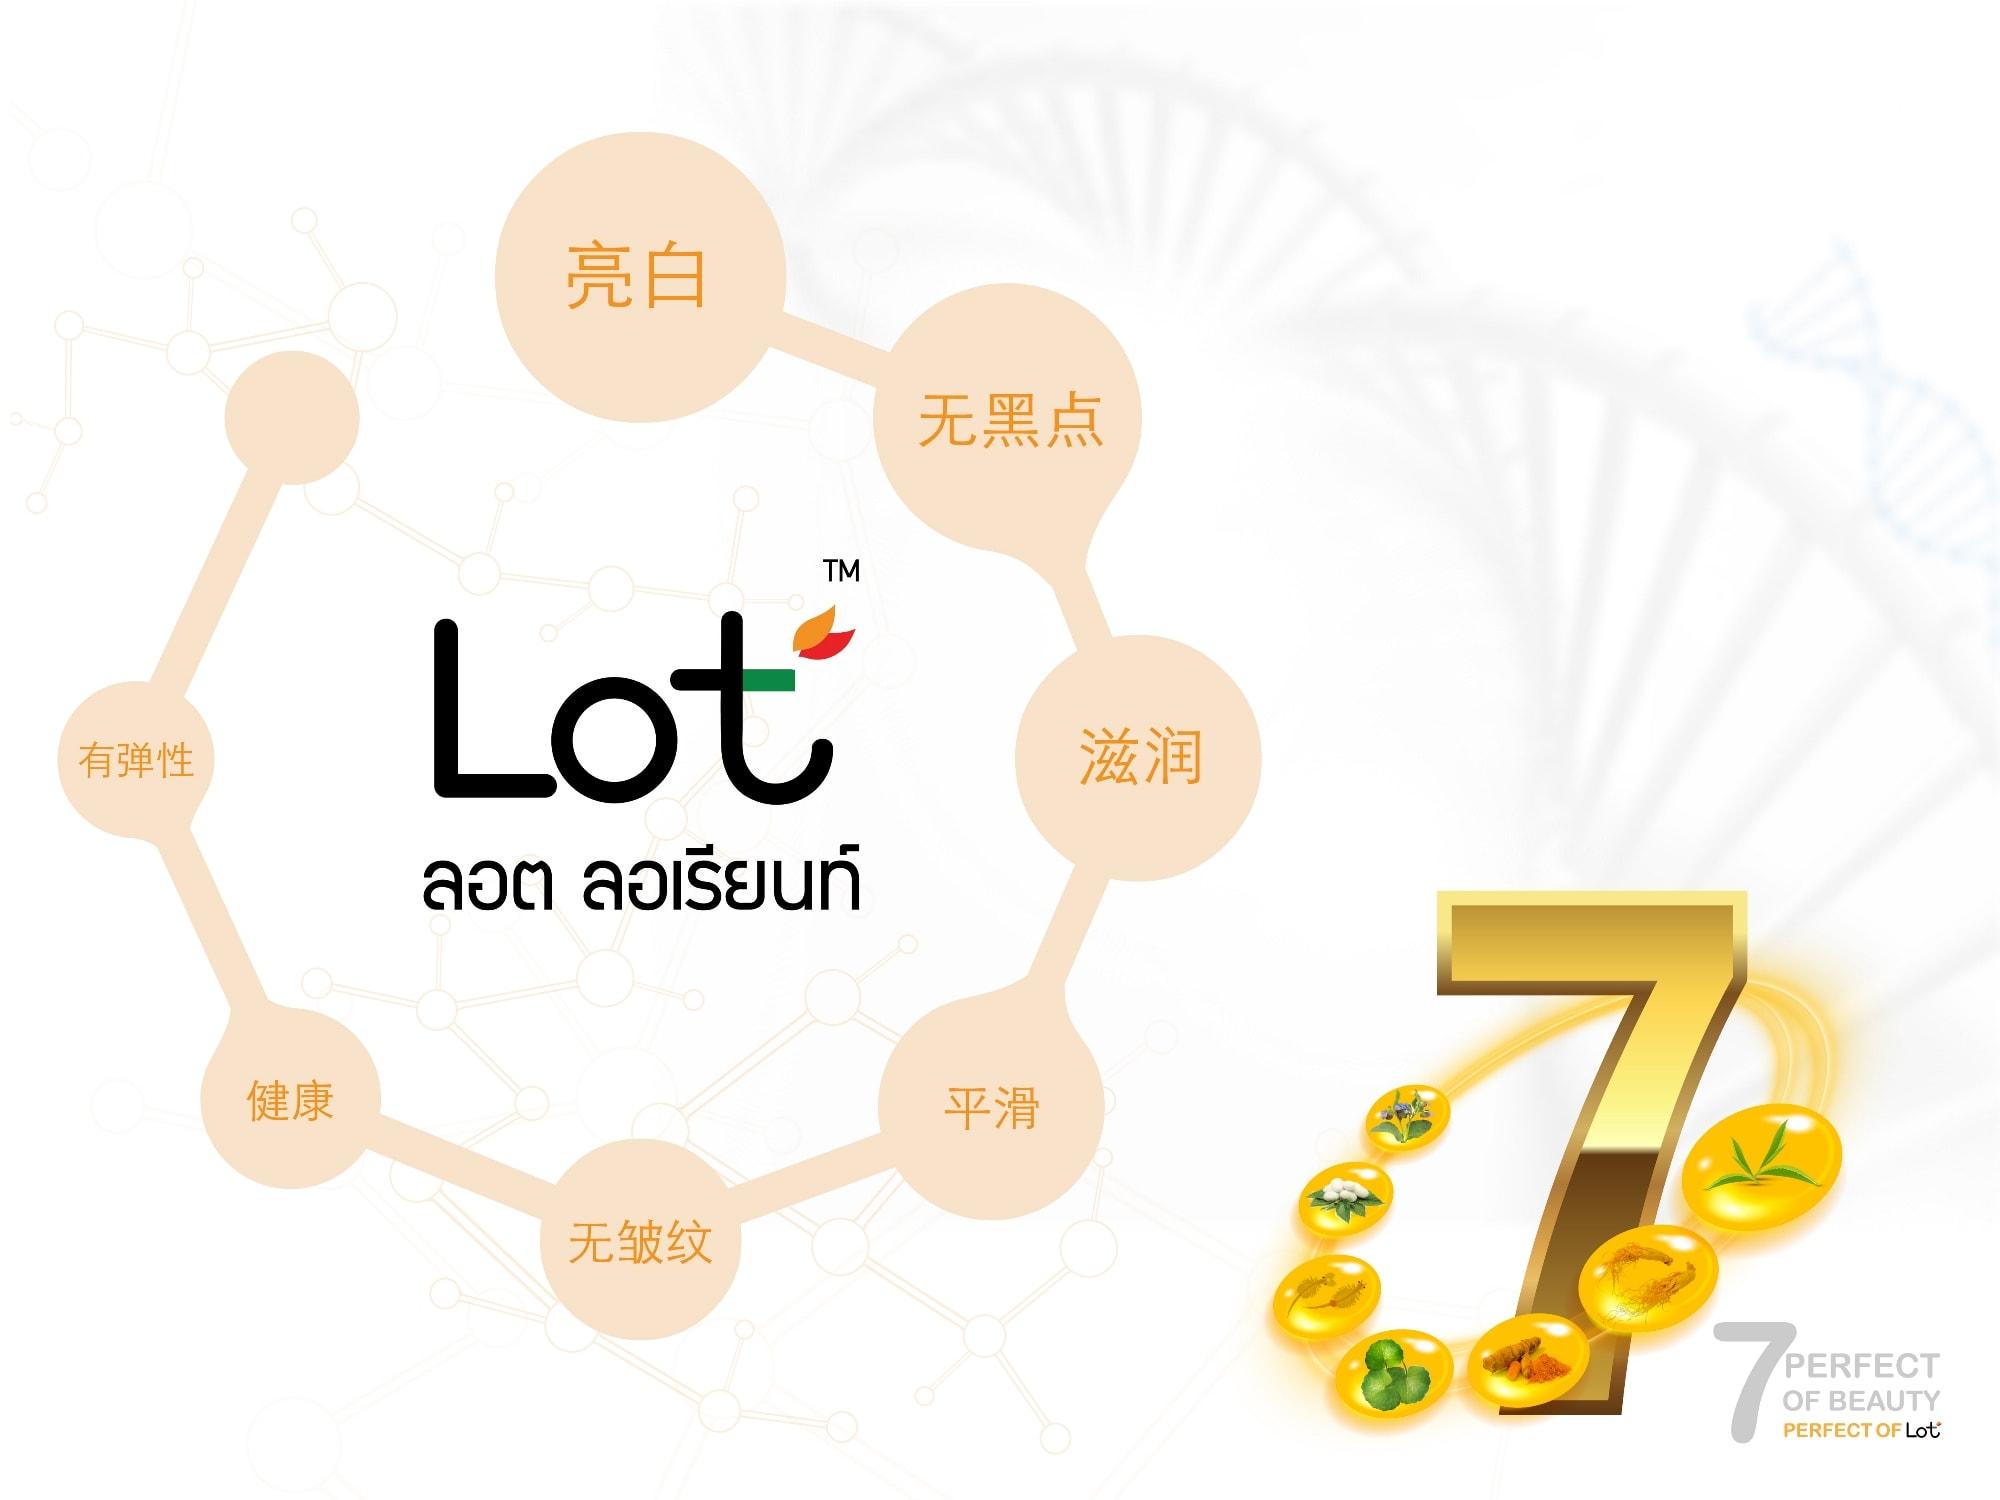 7 Perfect of LOT (Chinese version) โดย ลอต ลอเรียนท์ LOT LORIENT